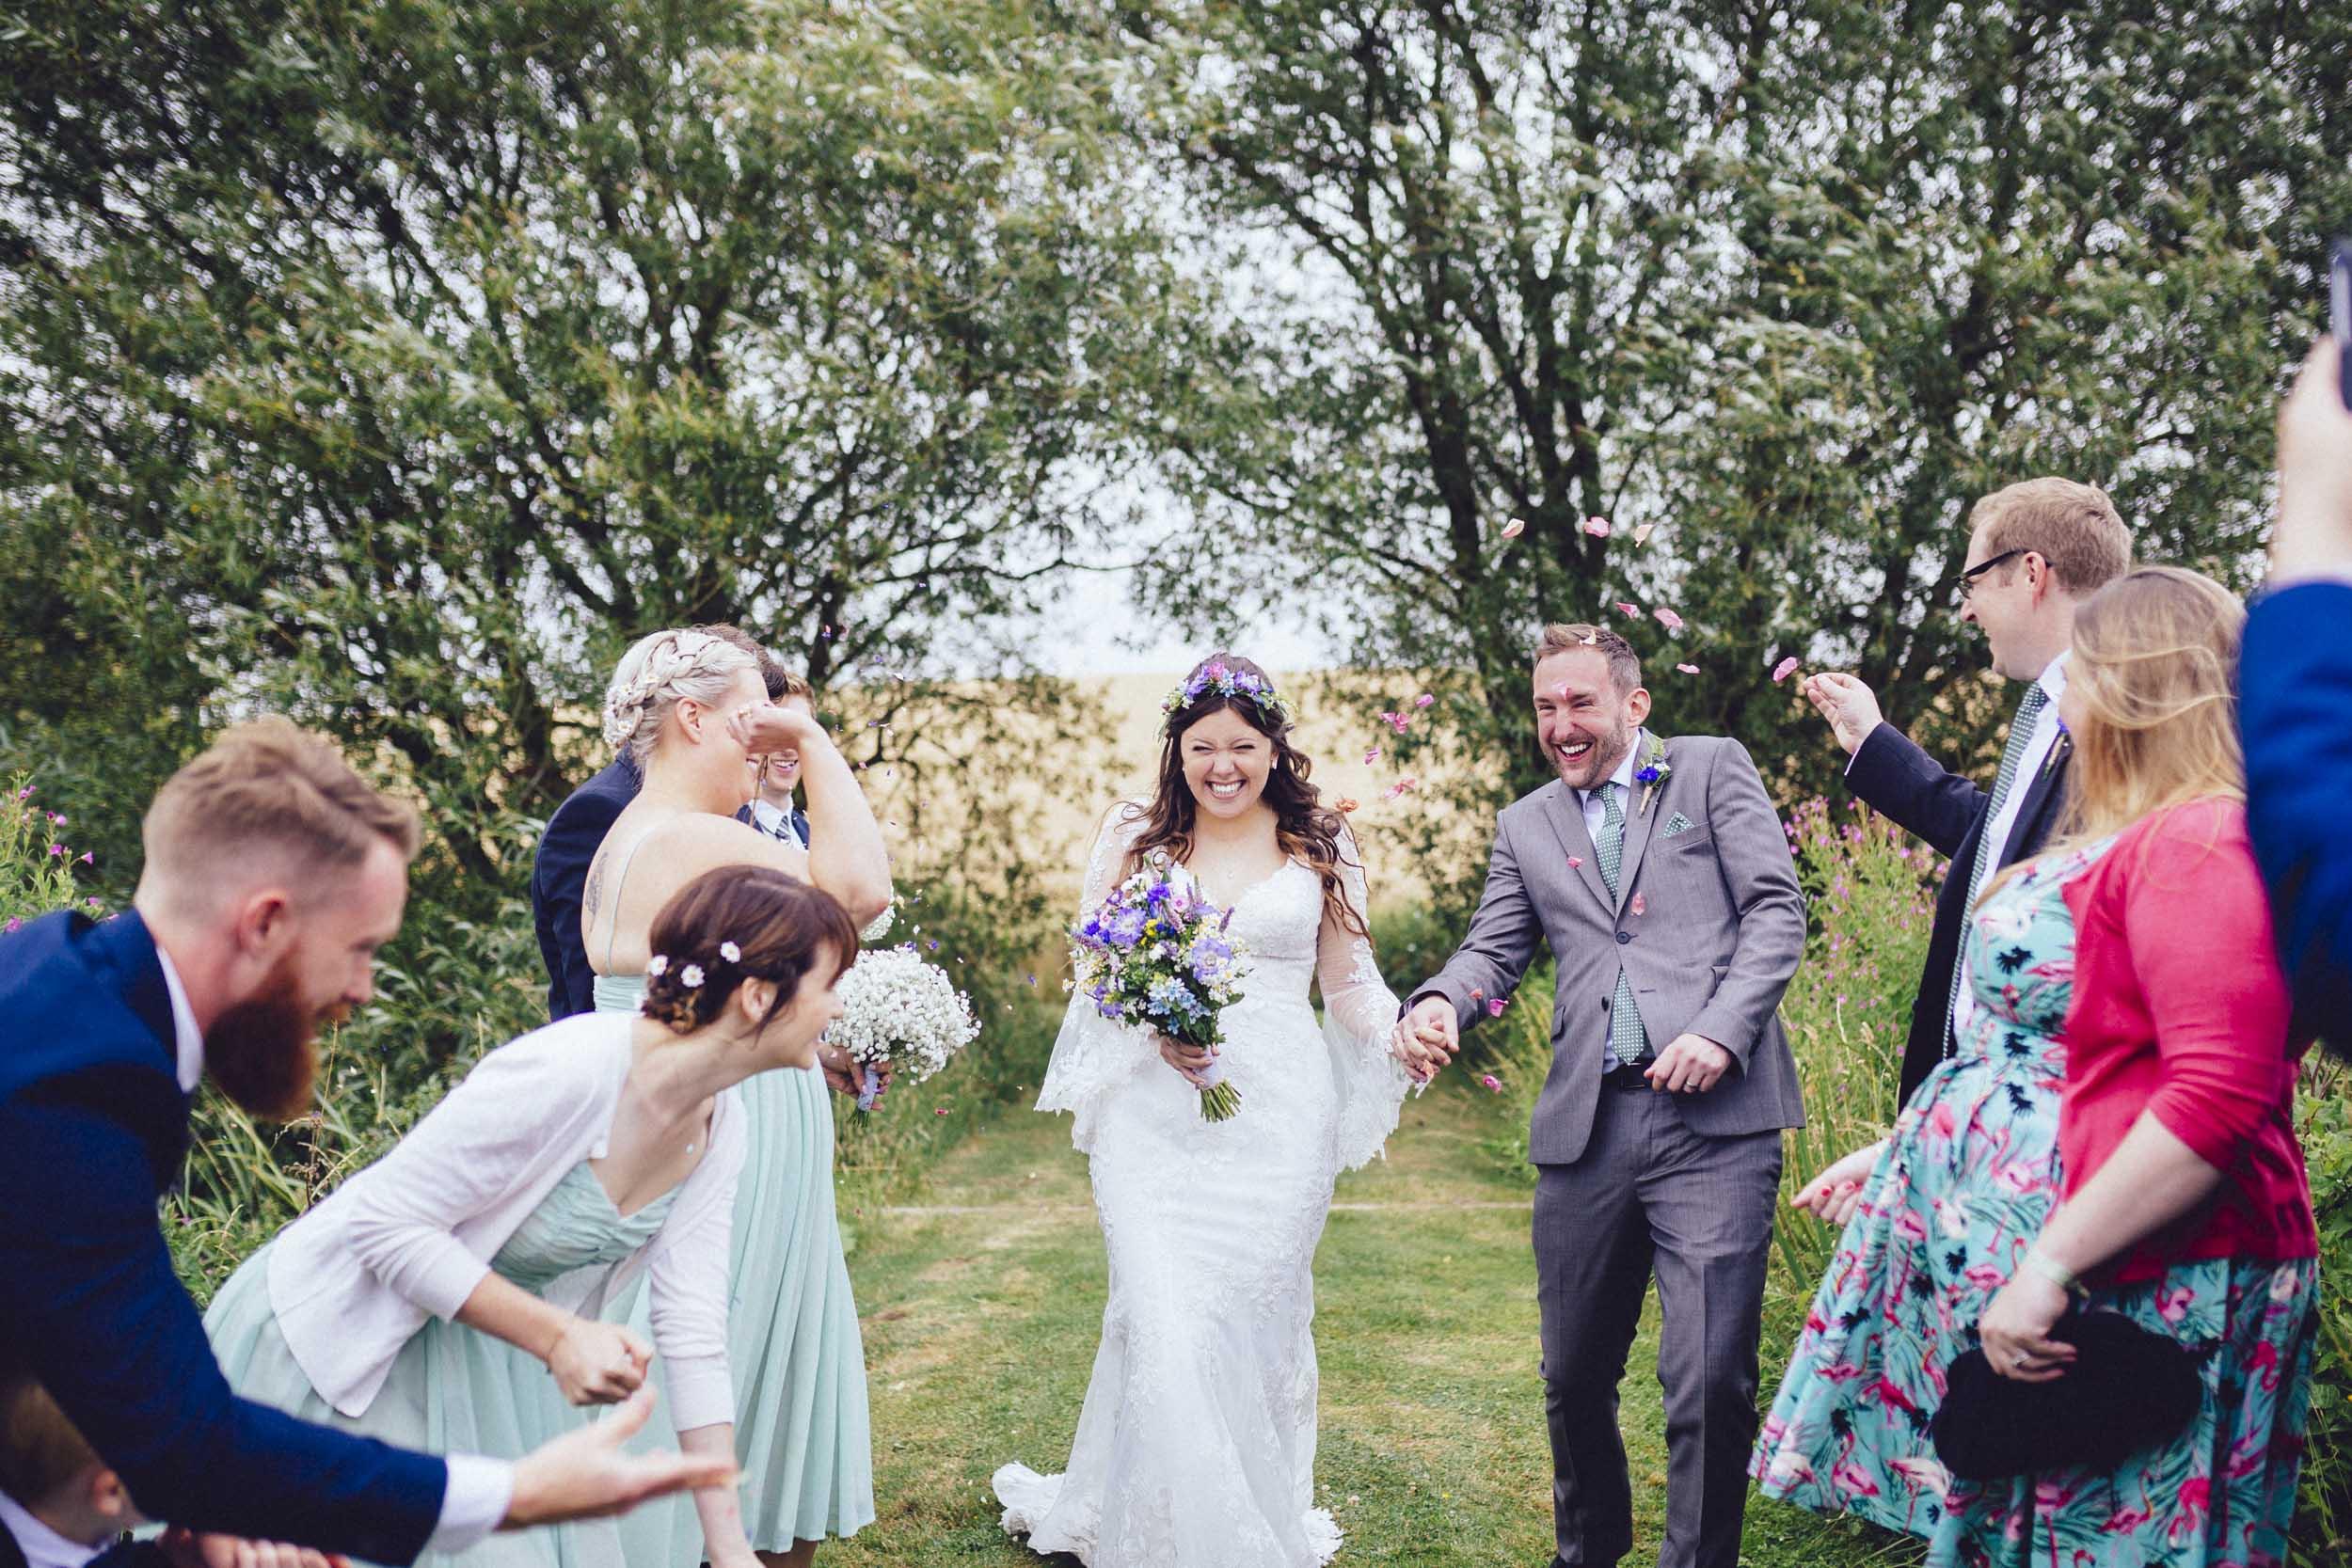 20Curious Rose Wedding Photography- Laura Rhodes- Newton Park Farm- Birmingham Artistic wedding photography- confetti bride and groom.jpg